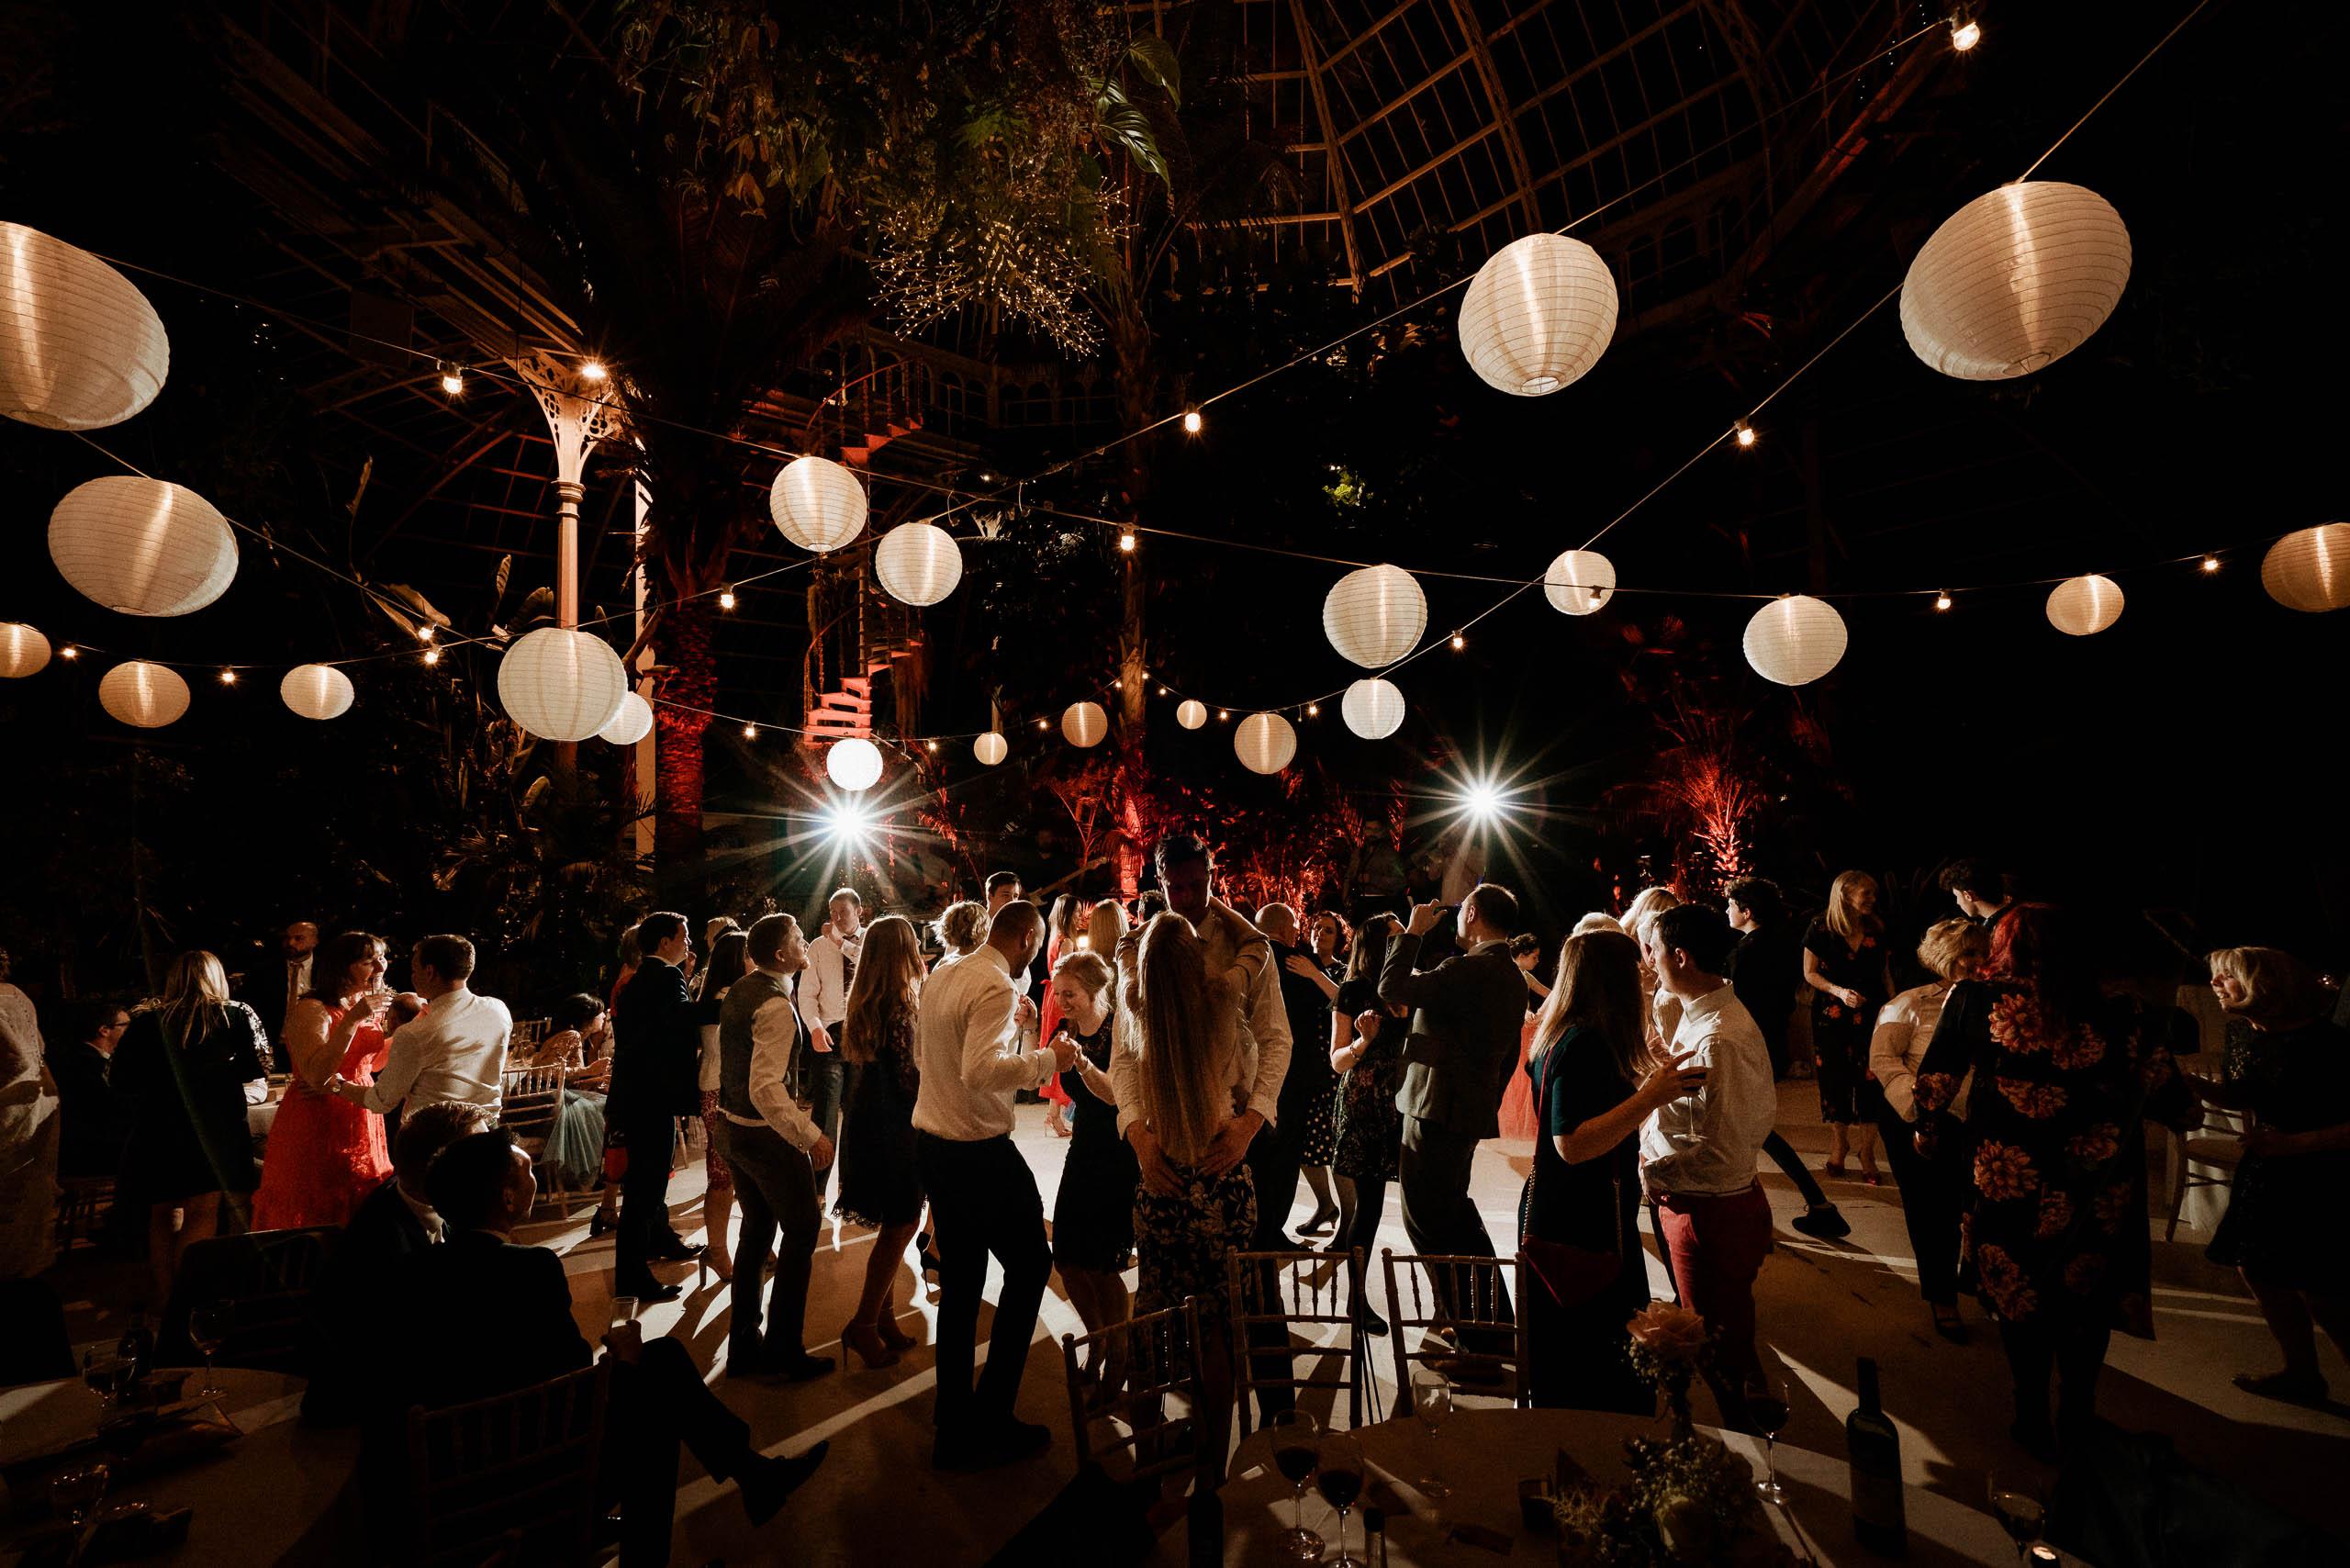 wedding guests dancing under paper lanterns